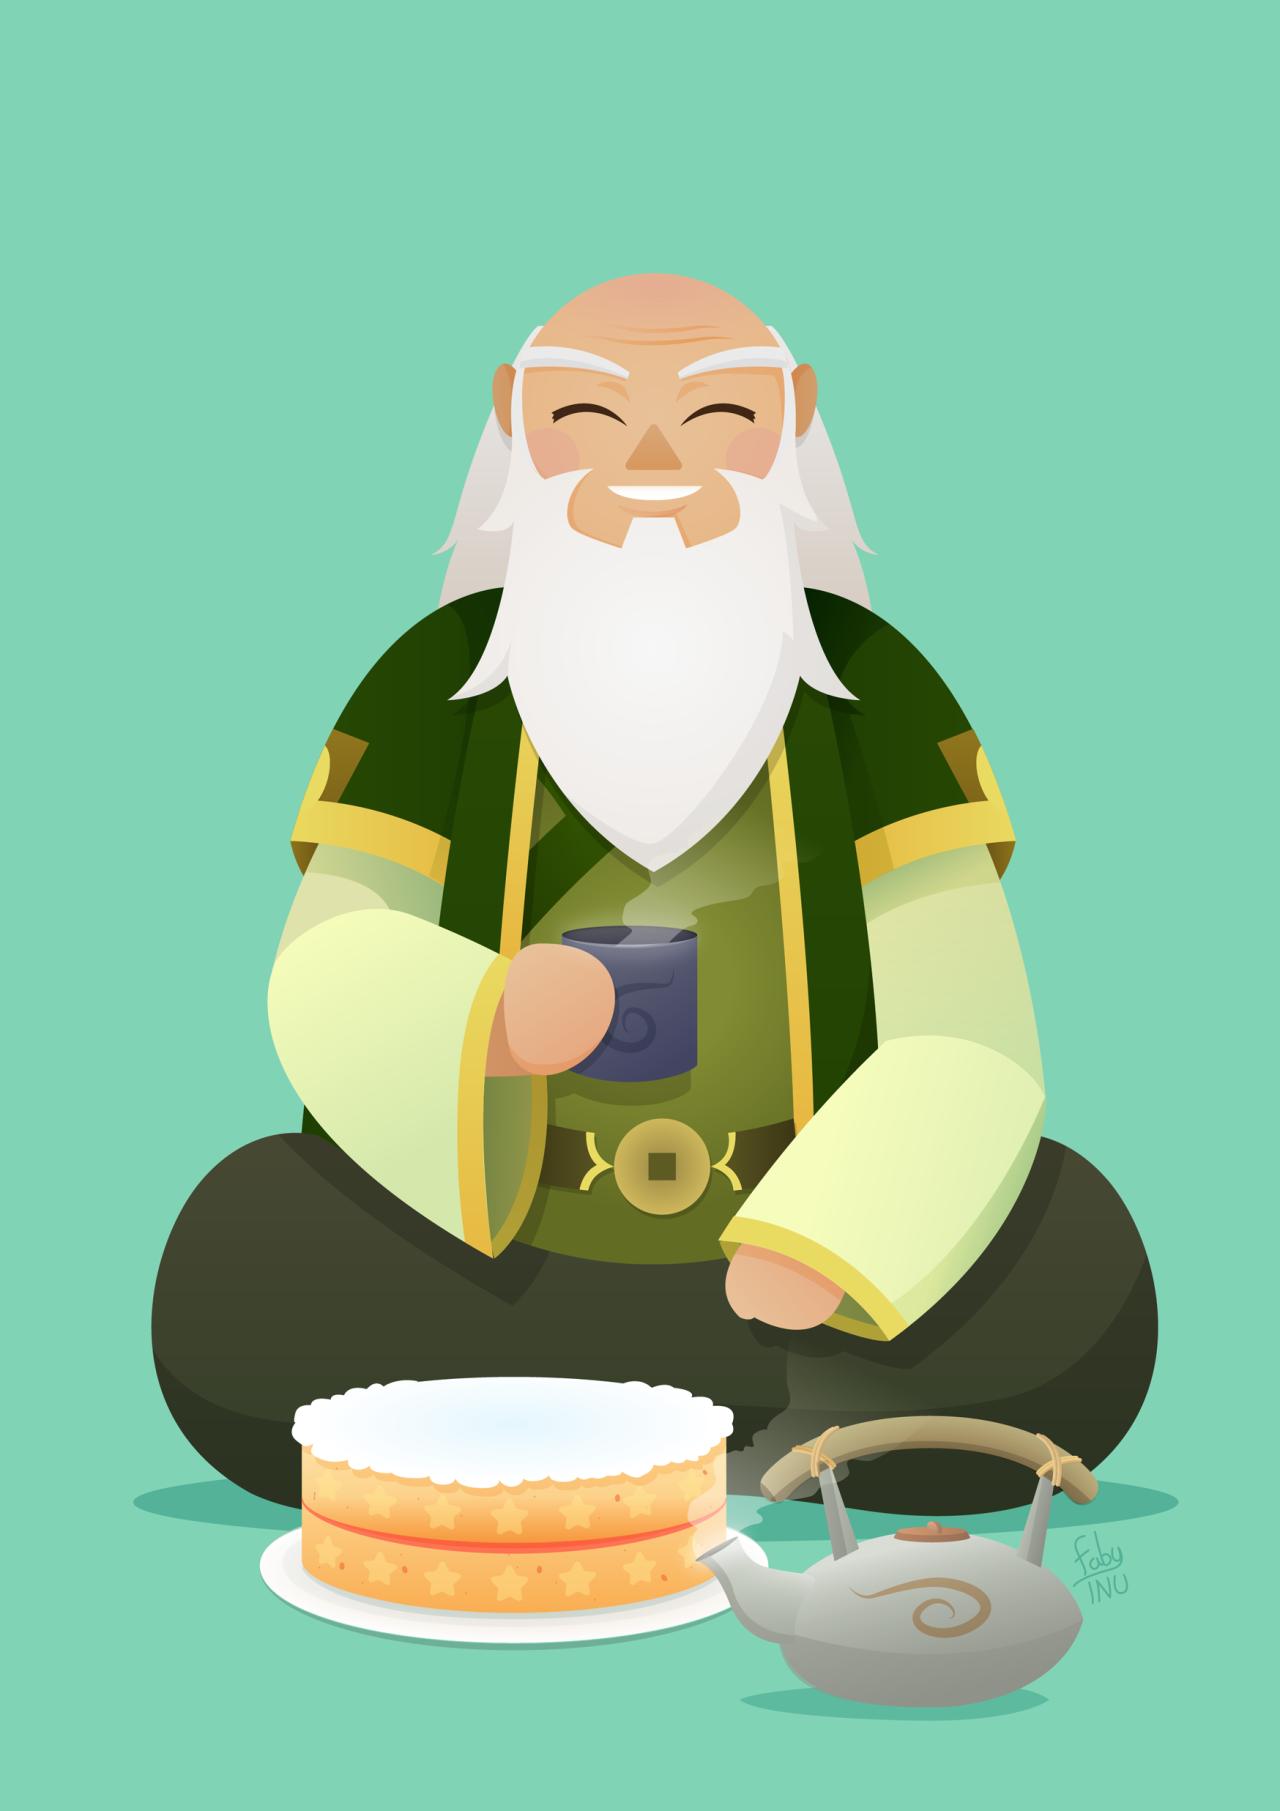 New Avatar Series 2020.Uncle Iroh 2020 Avatar The Last Airbender Art Iroh